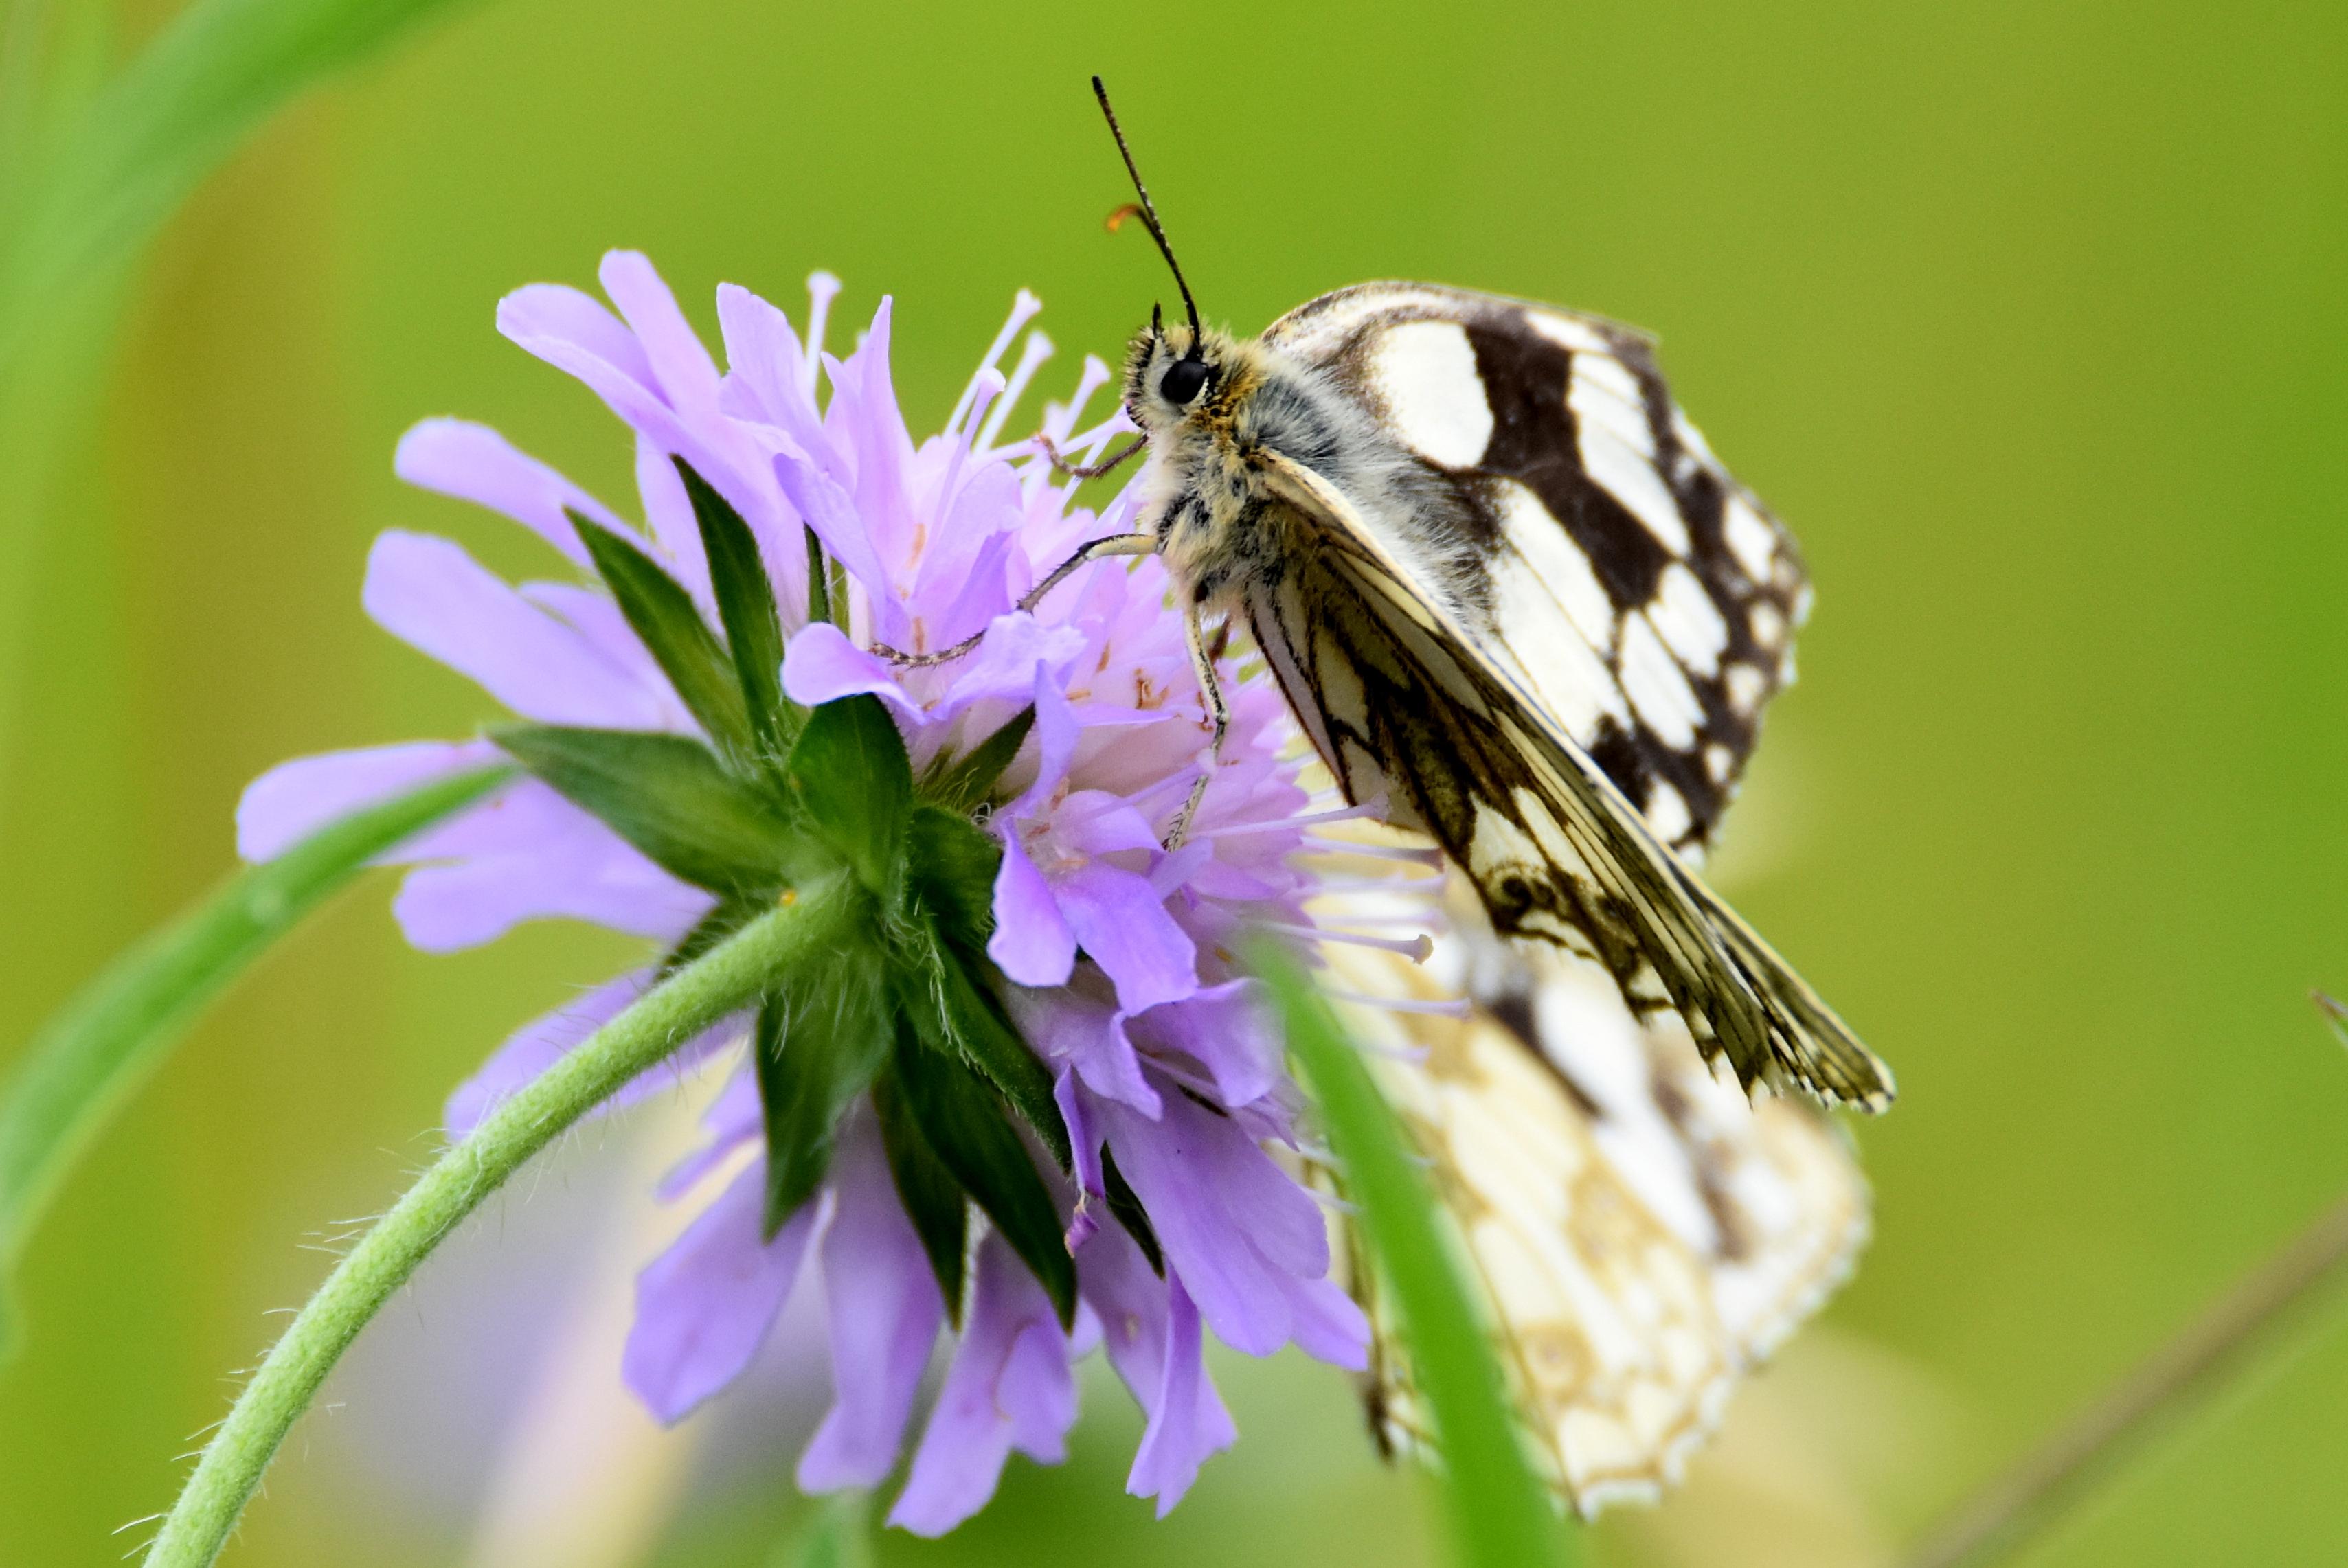 Wallpaper butterfly insect marbledwhites closeup beauty butterfly insect marbledwhites closeup beauty nature wildlife animals flower purple white kent bokeh izmirmasajfo